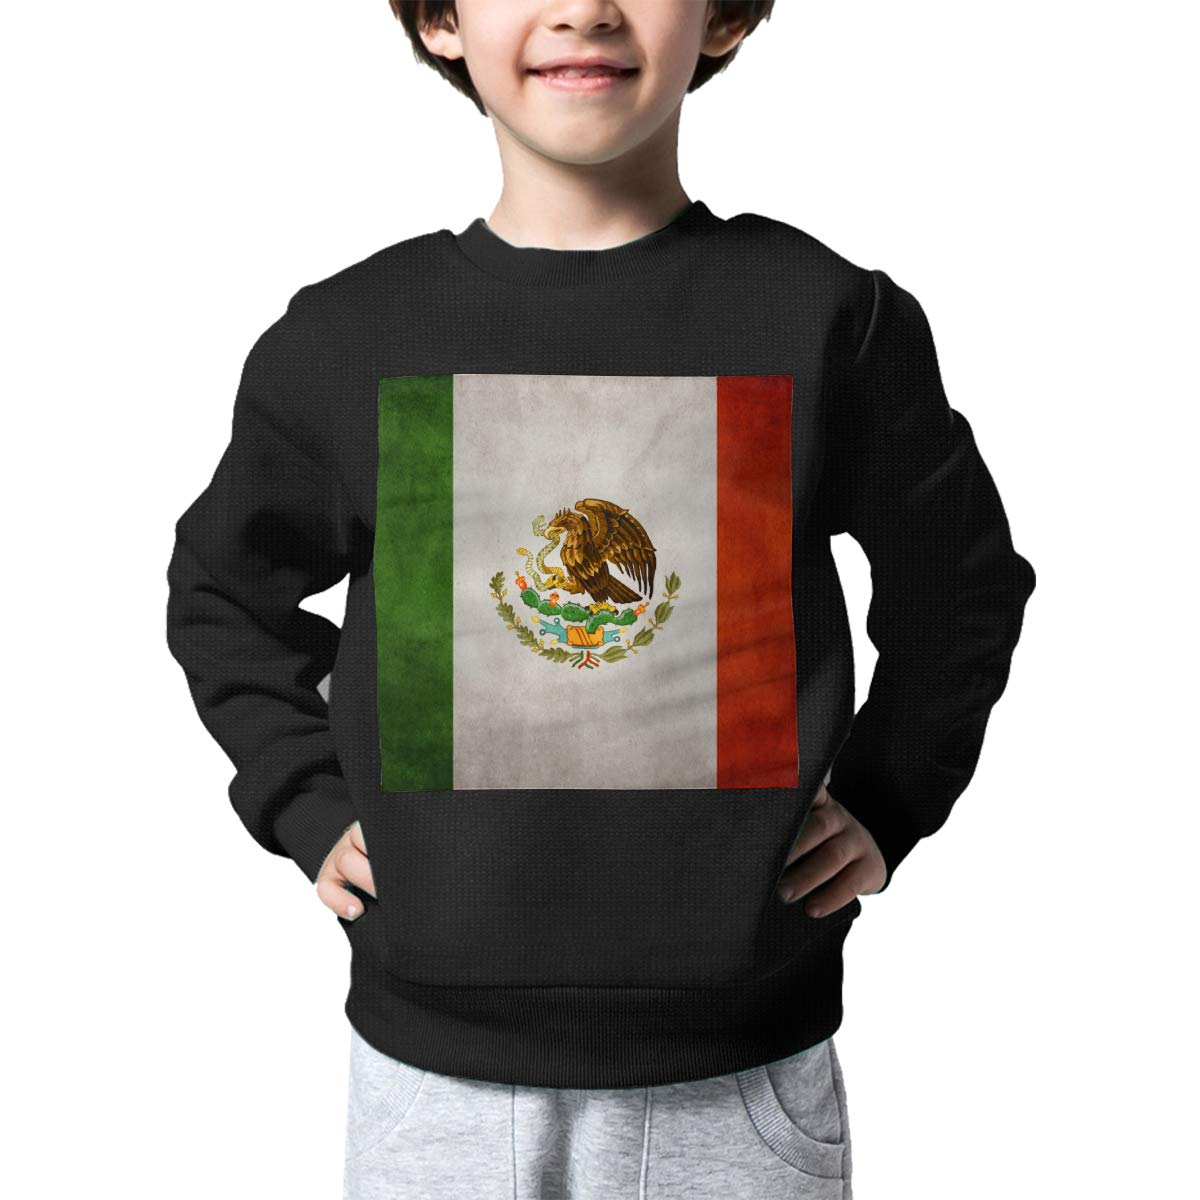 Boys Girls Vintage Mexico Flag Lovely Sweaters Soft Warm Unisex Children Kids Sweater